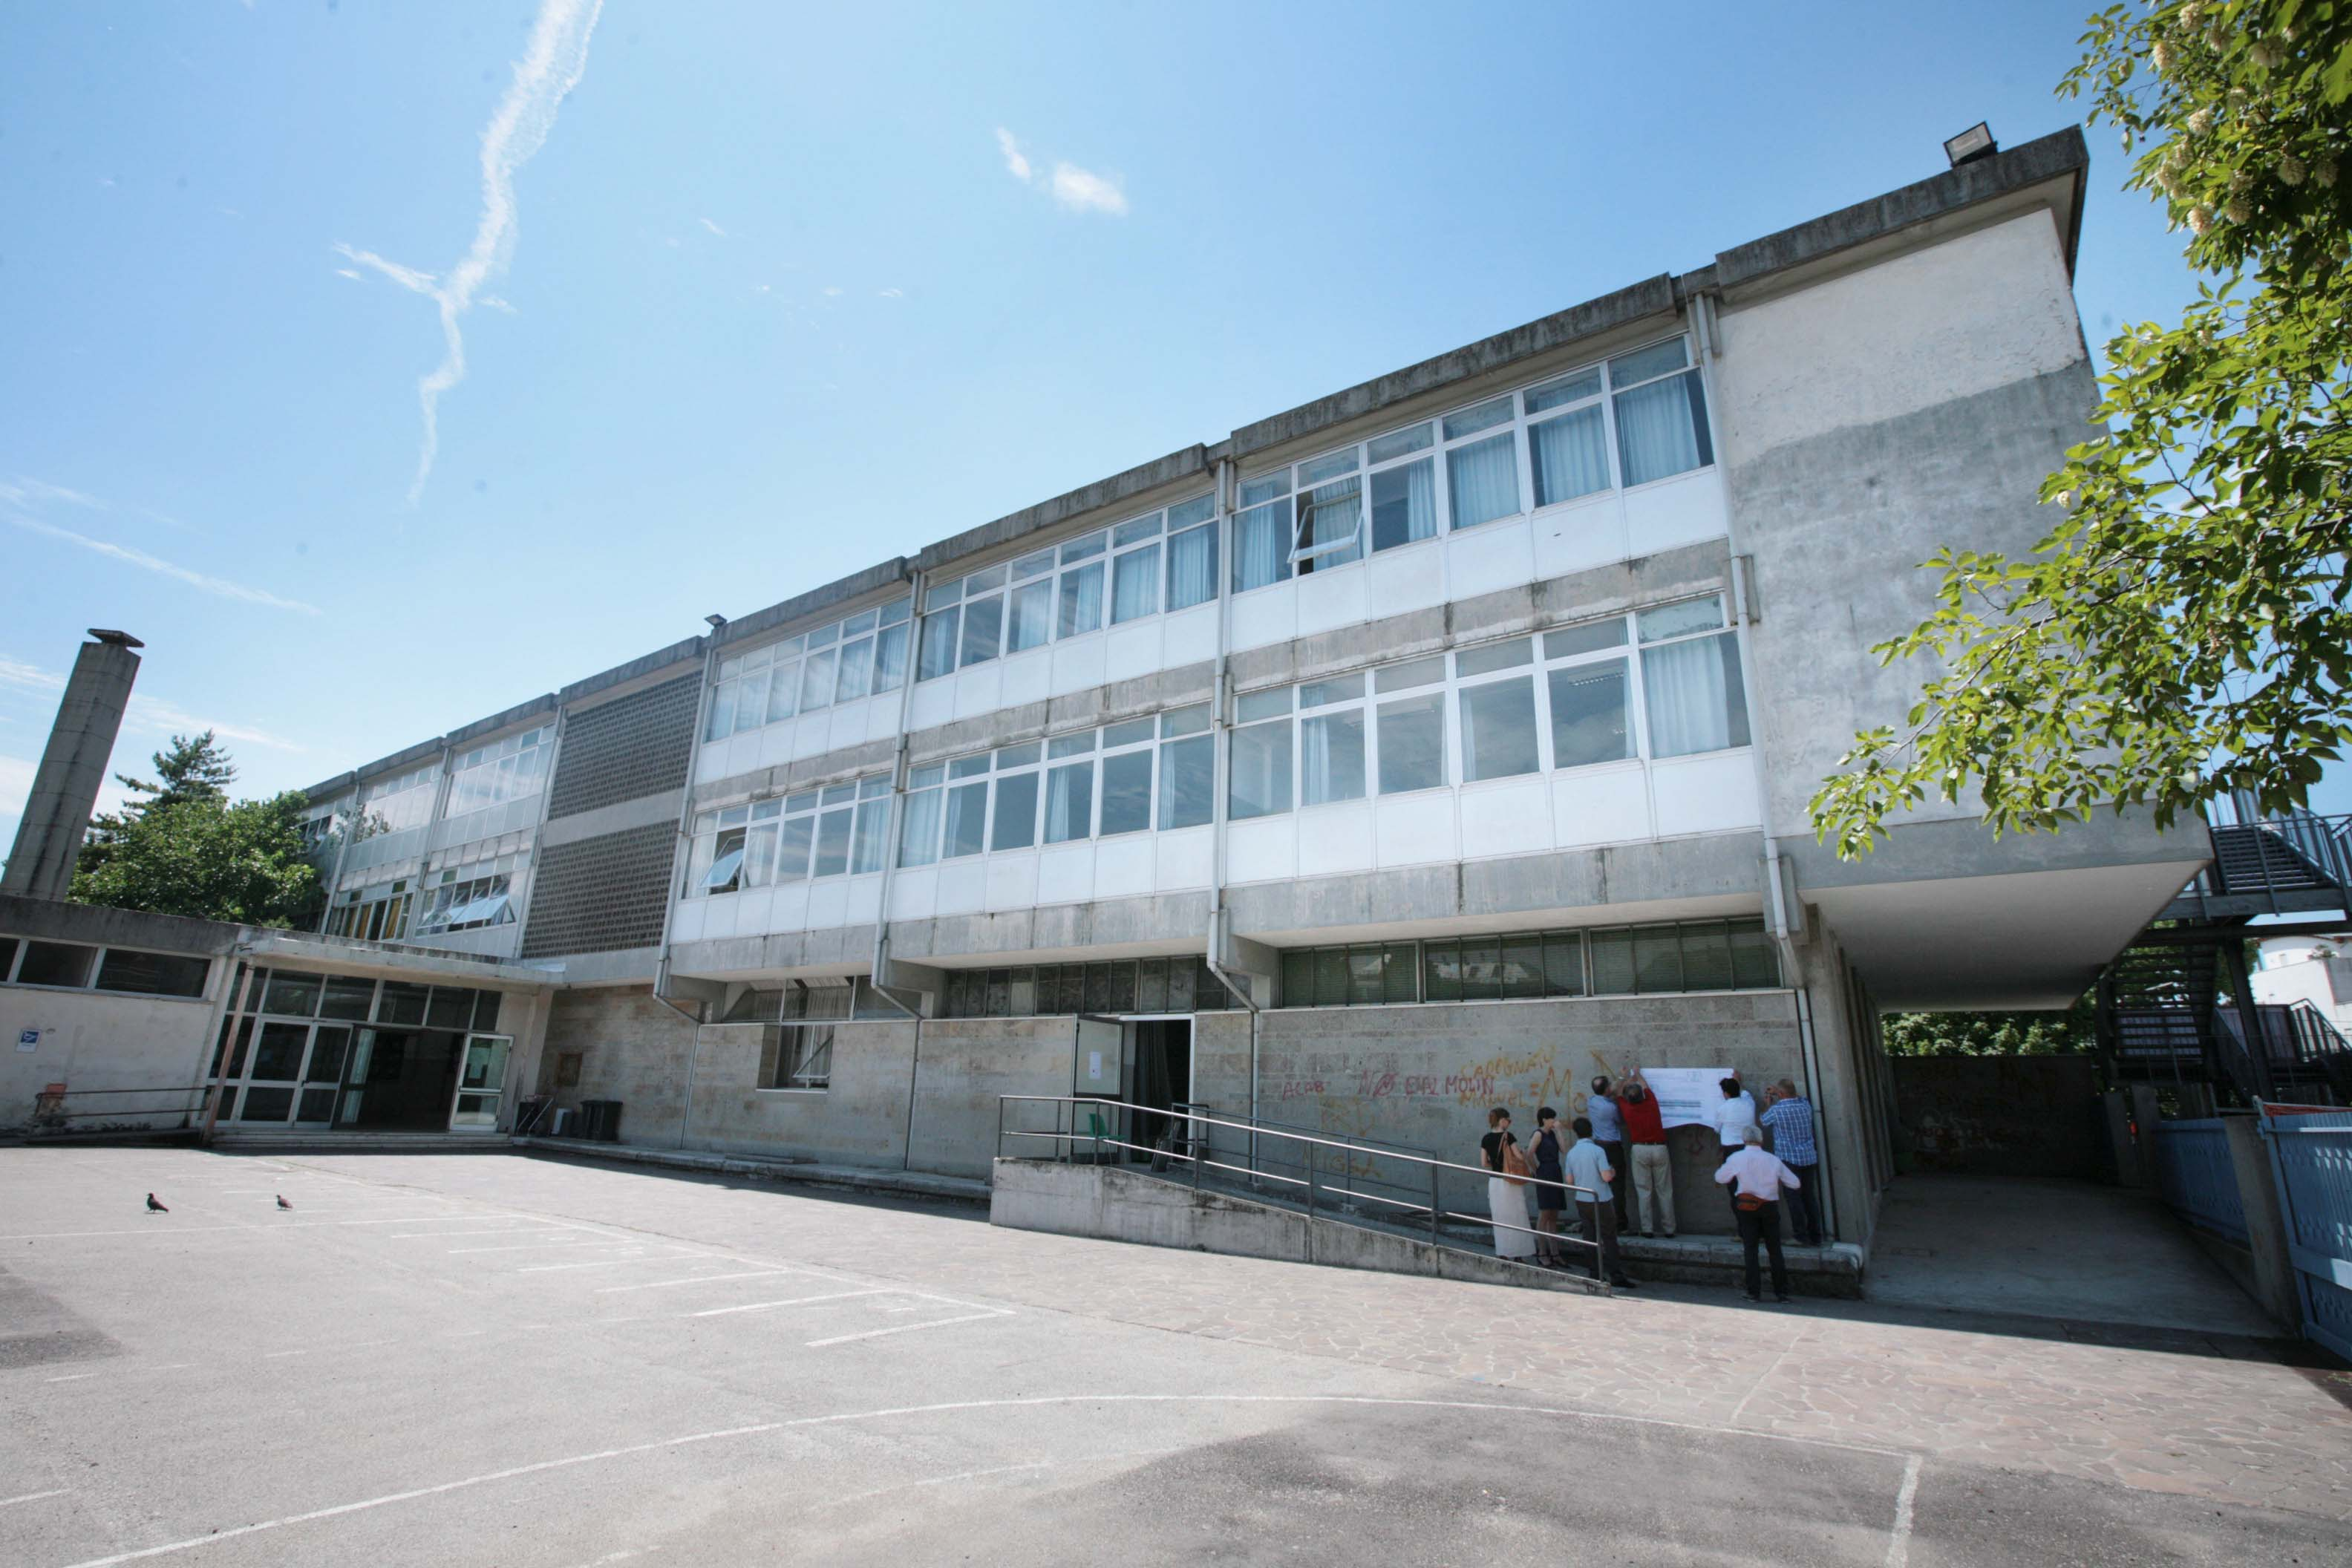 Scuola media Calderari, Vicenza